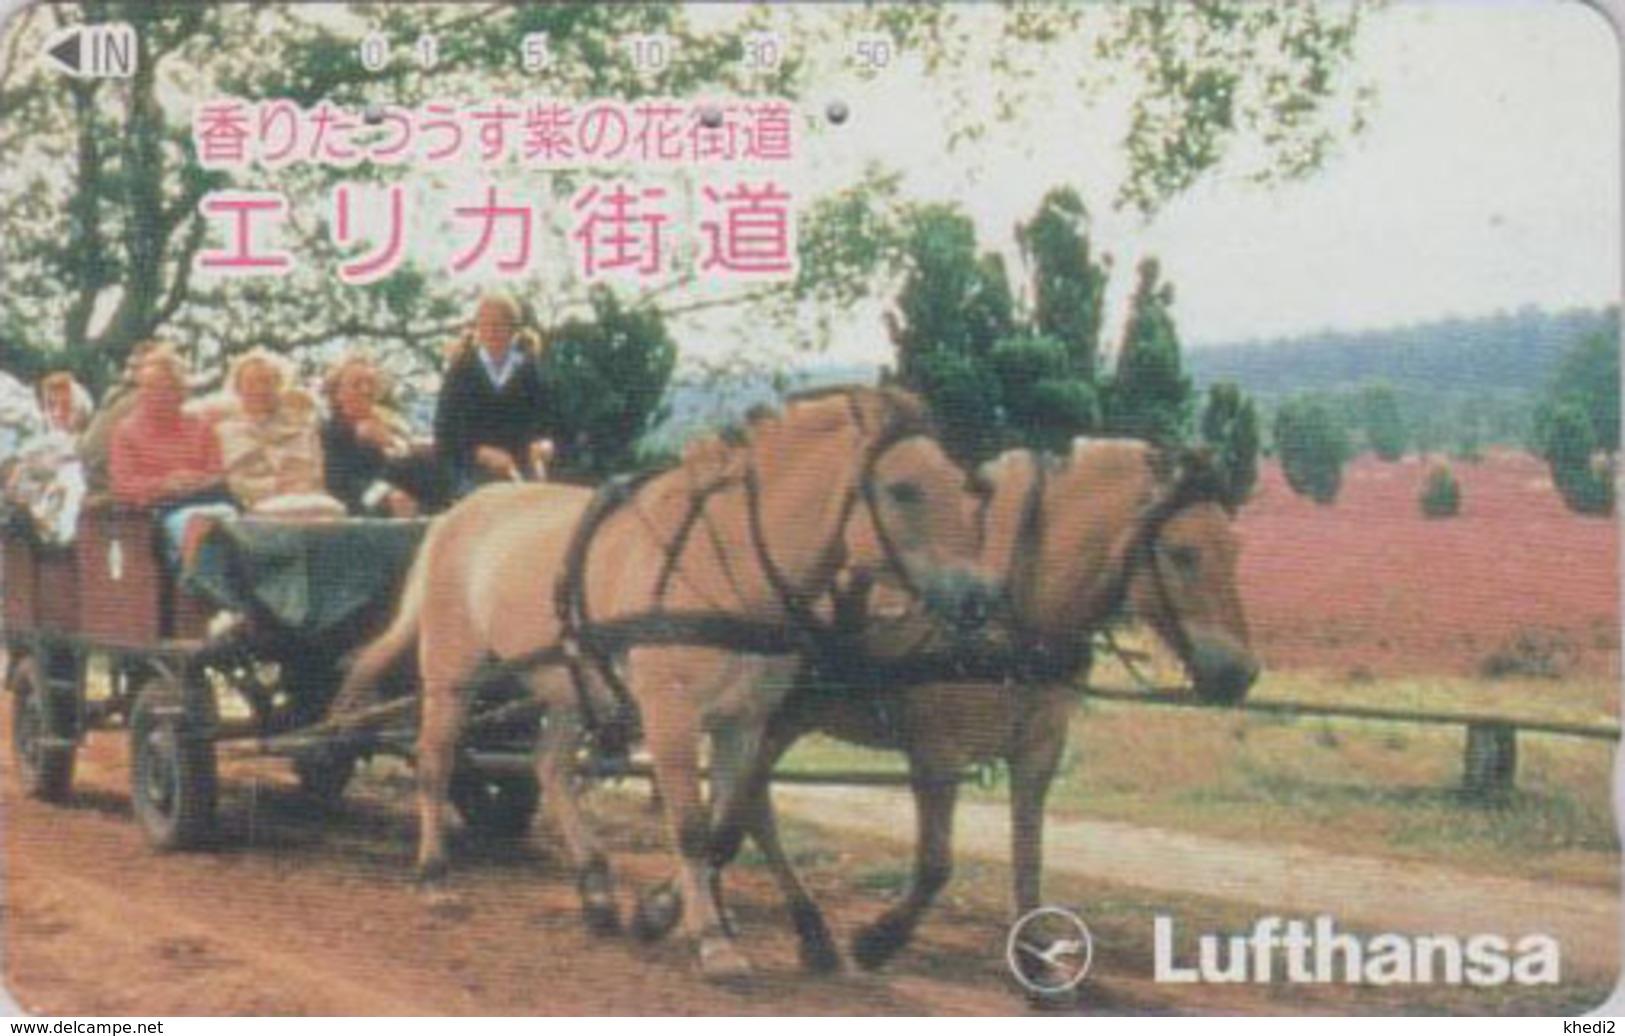 RRR RARE TC Ancienne Japon / 110-011 - AVIATION - LUFTHANSA Germany Cheval - AIRLINES Japan Phonecard - Avion 2192 - Flugzeuge